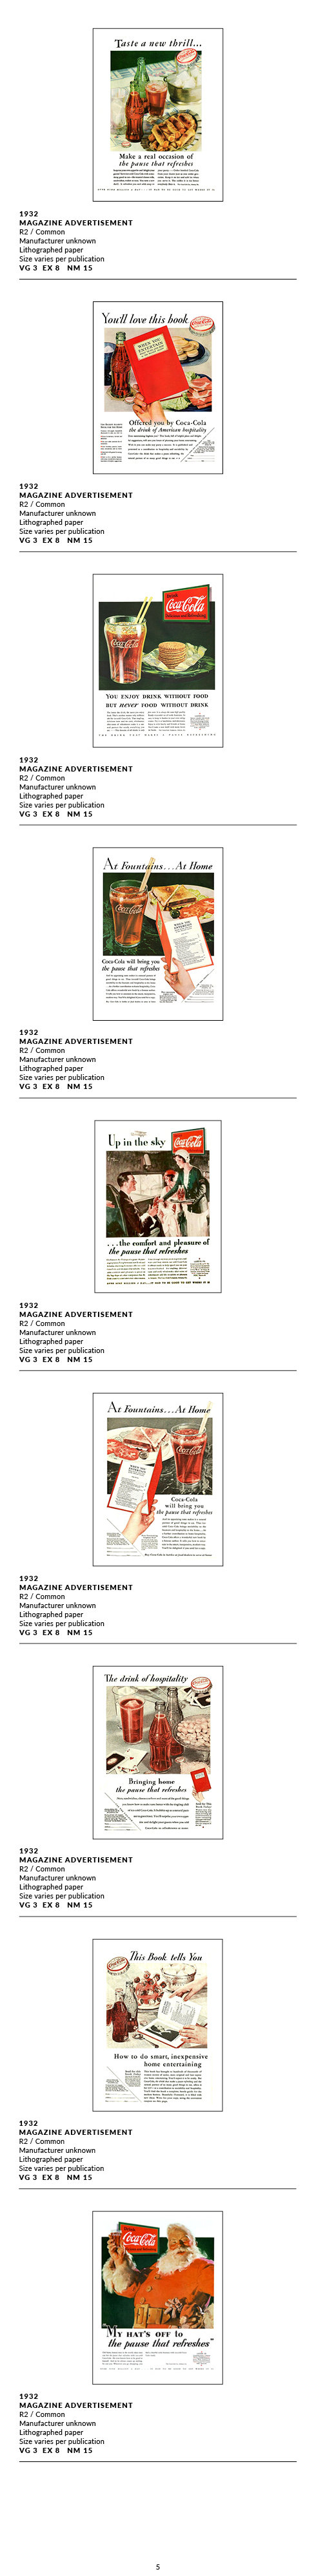 1930-34 Ads5.jpg